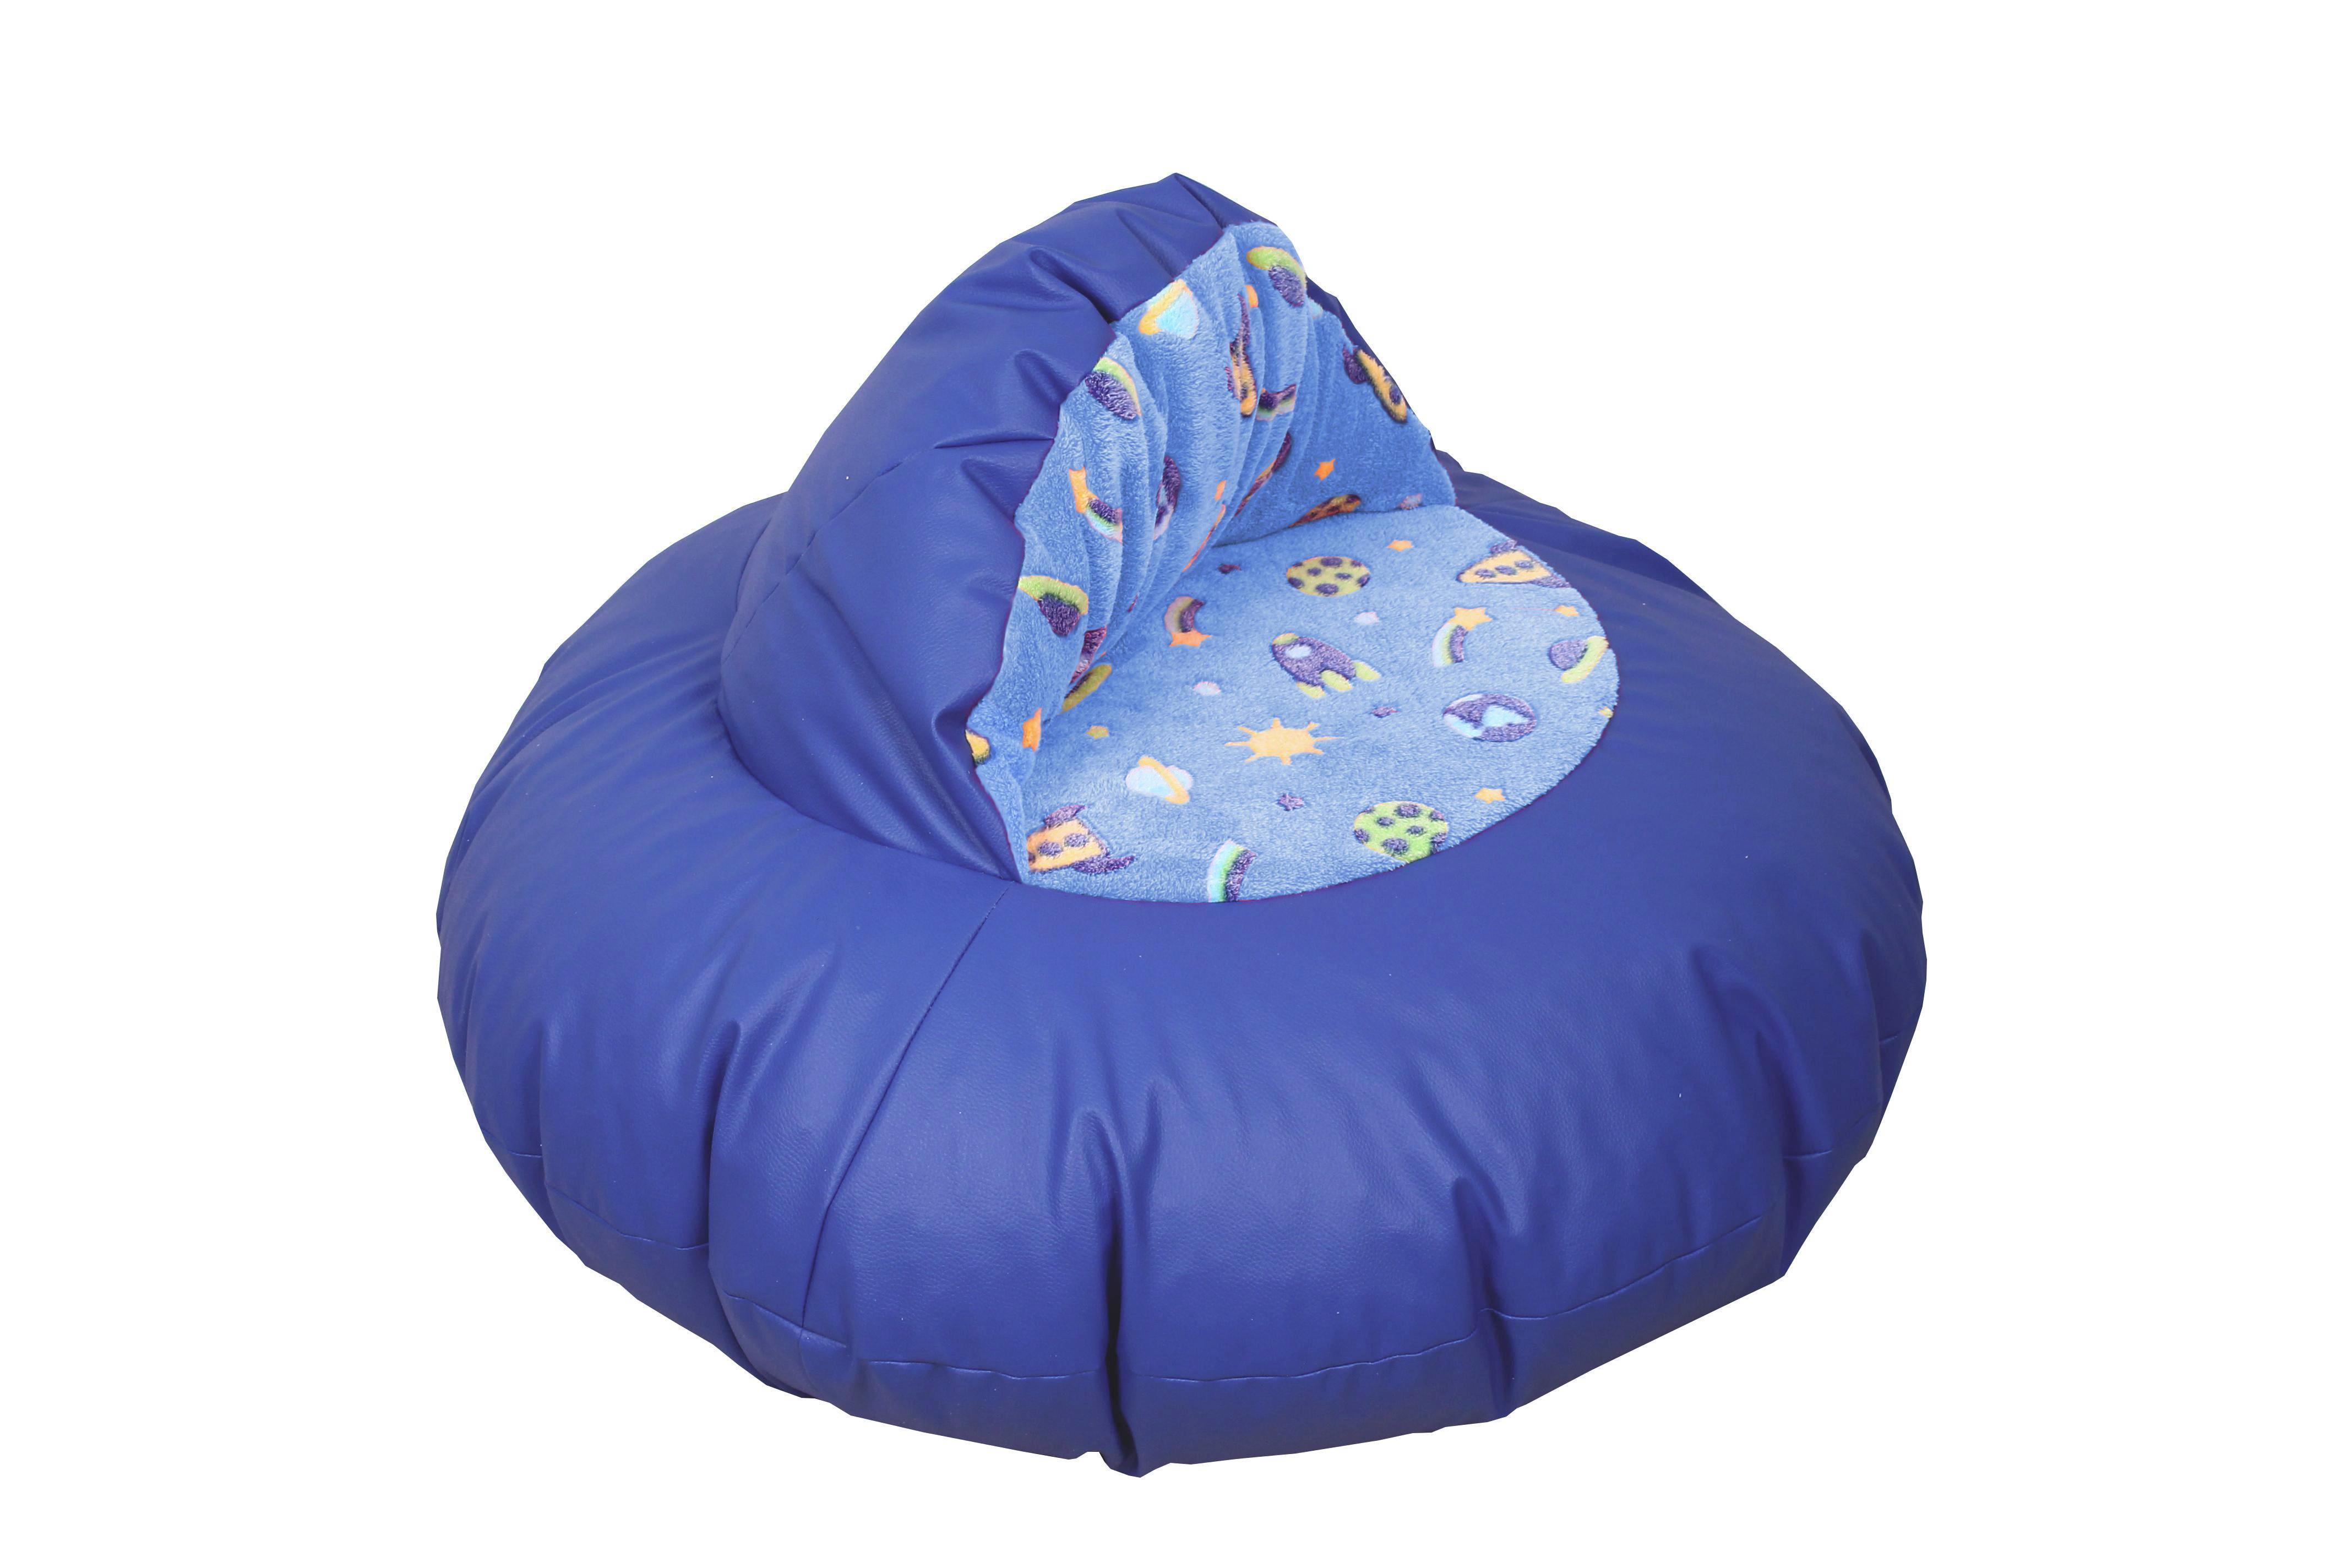 Sitzsack in Blau - Blau, Textil (100/60/100cm) - MODERN LIVING